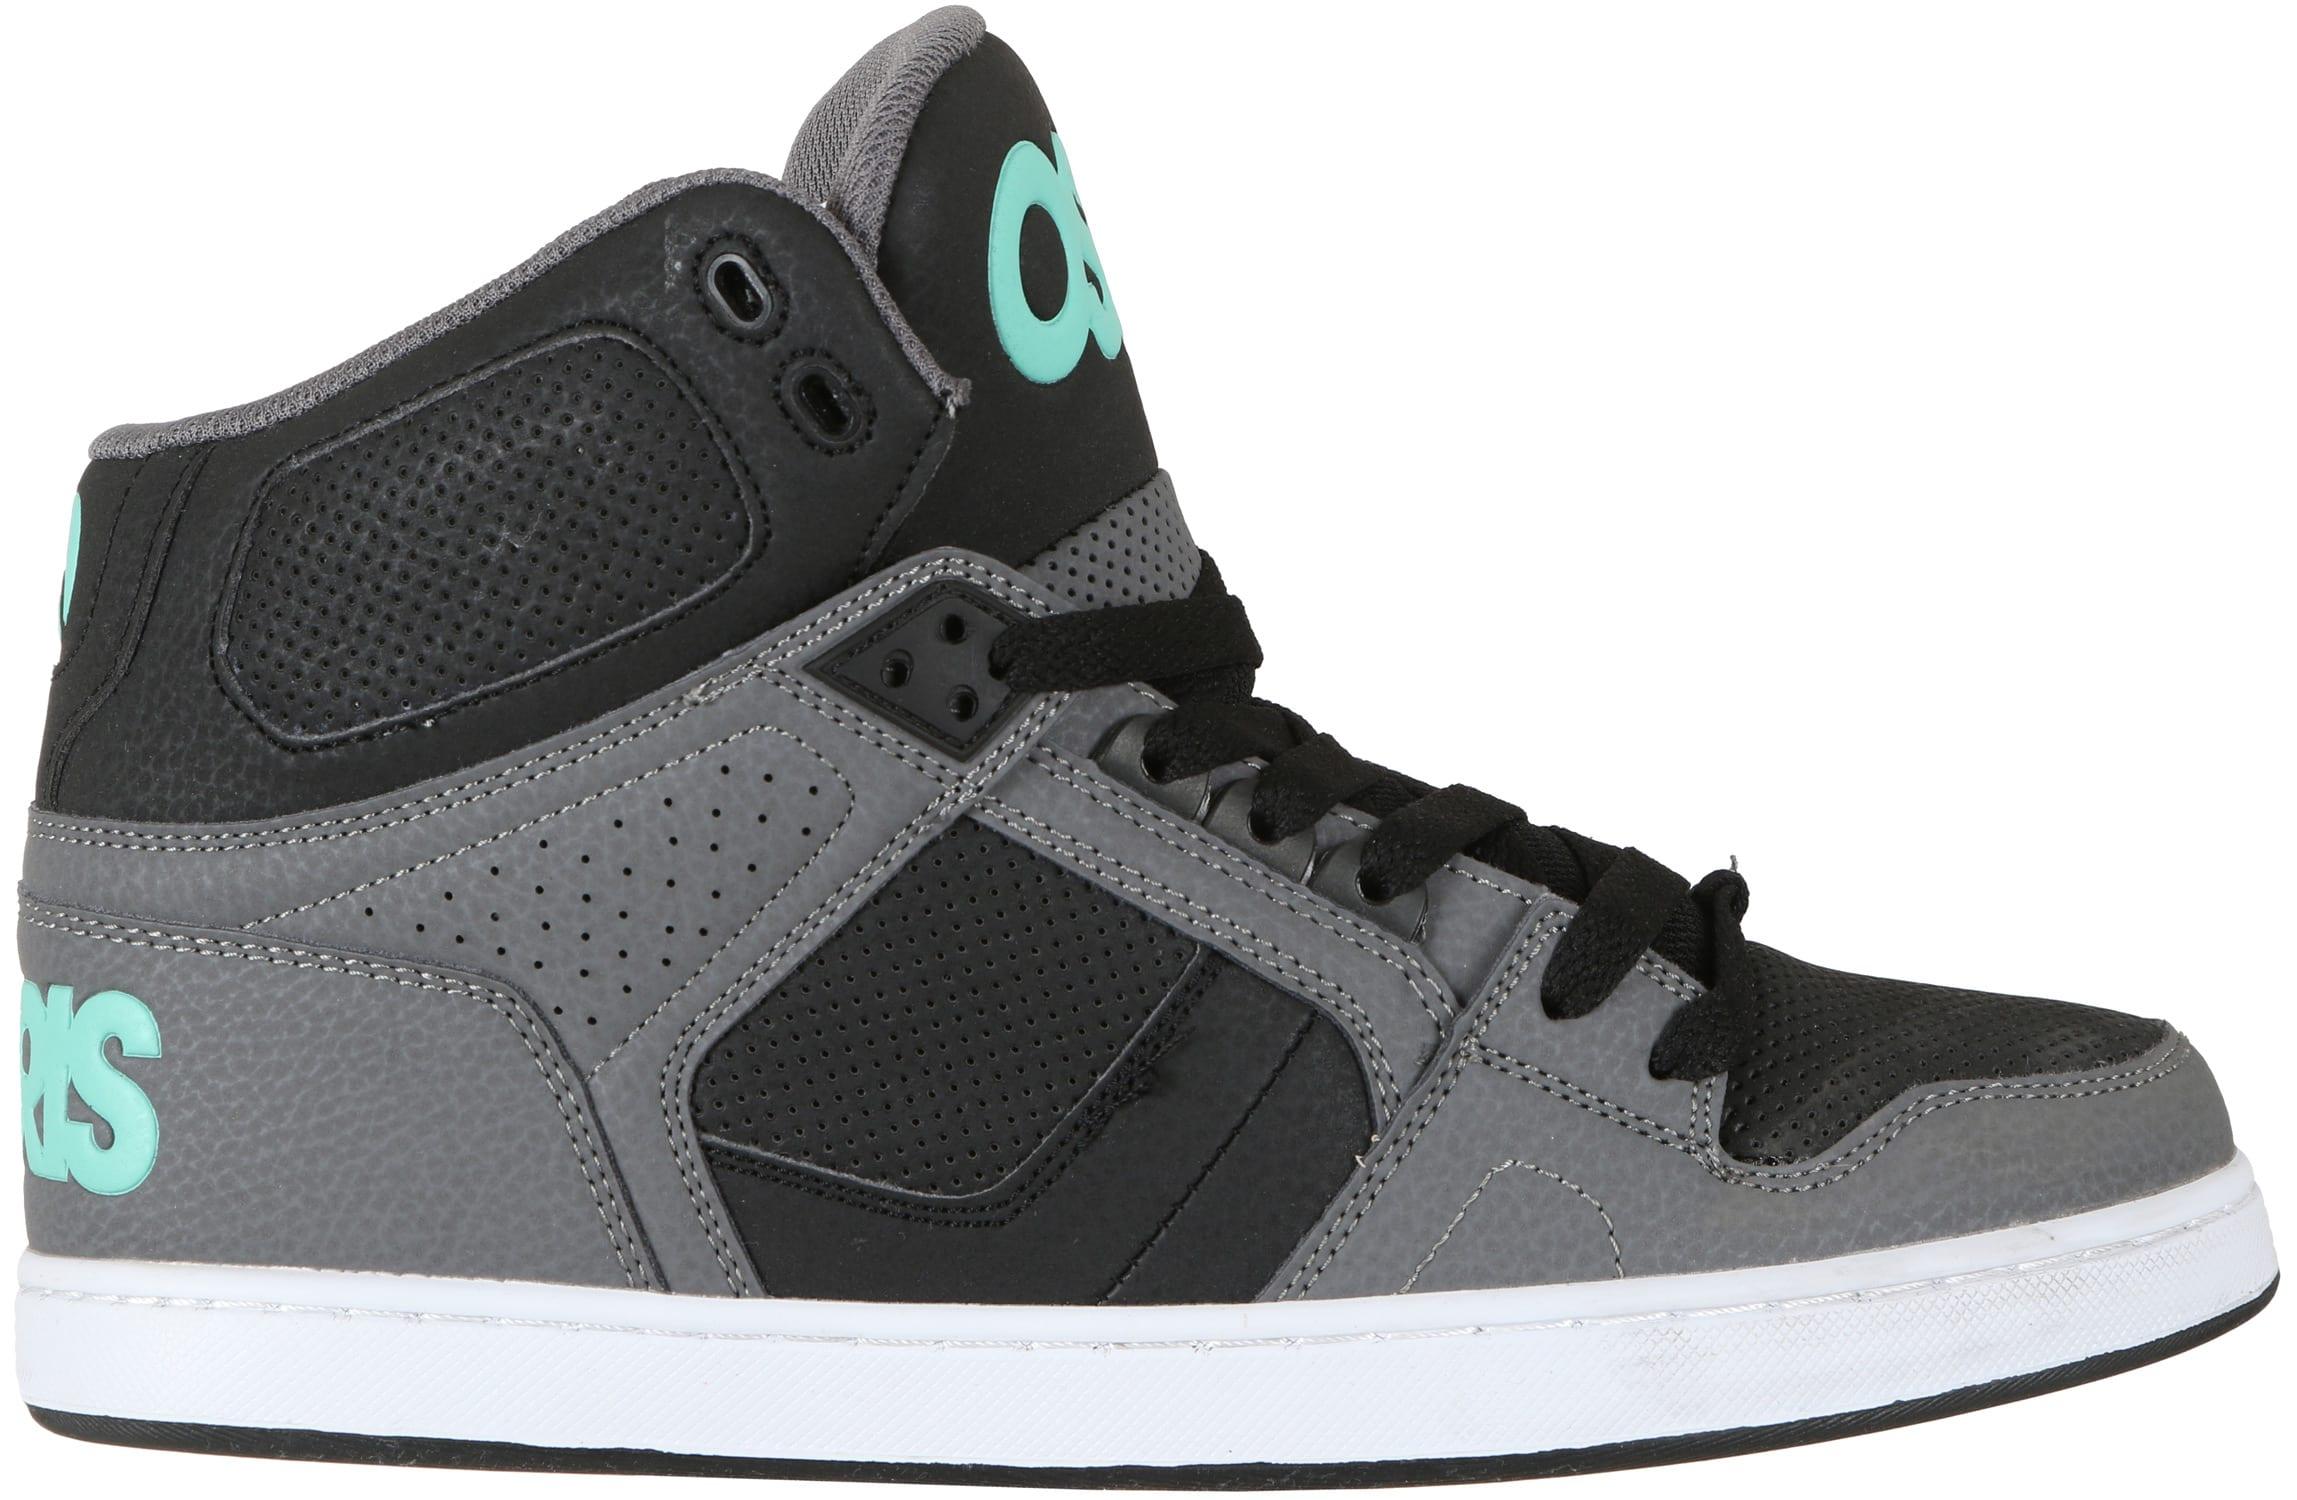 06b267ddfdc Osiris NYC 83 CLK Skate Shoes - thumbnail 1